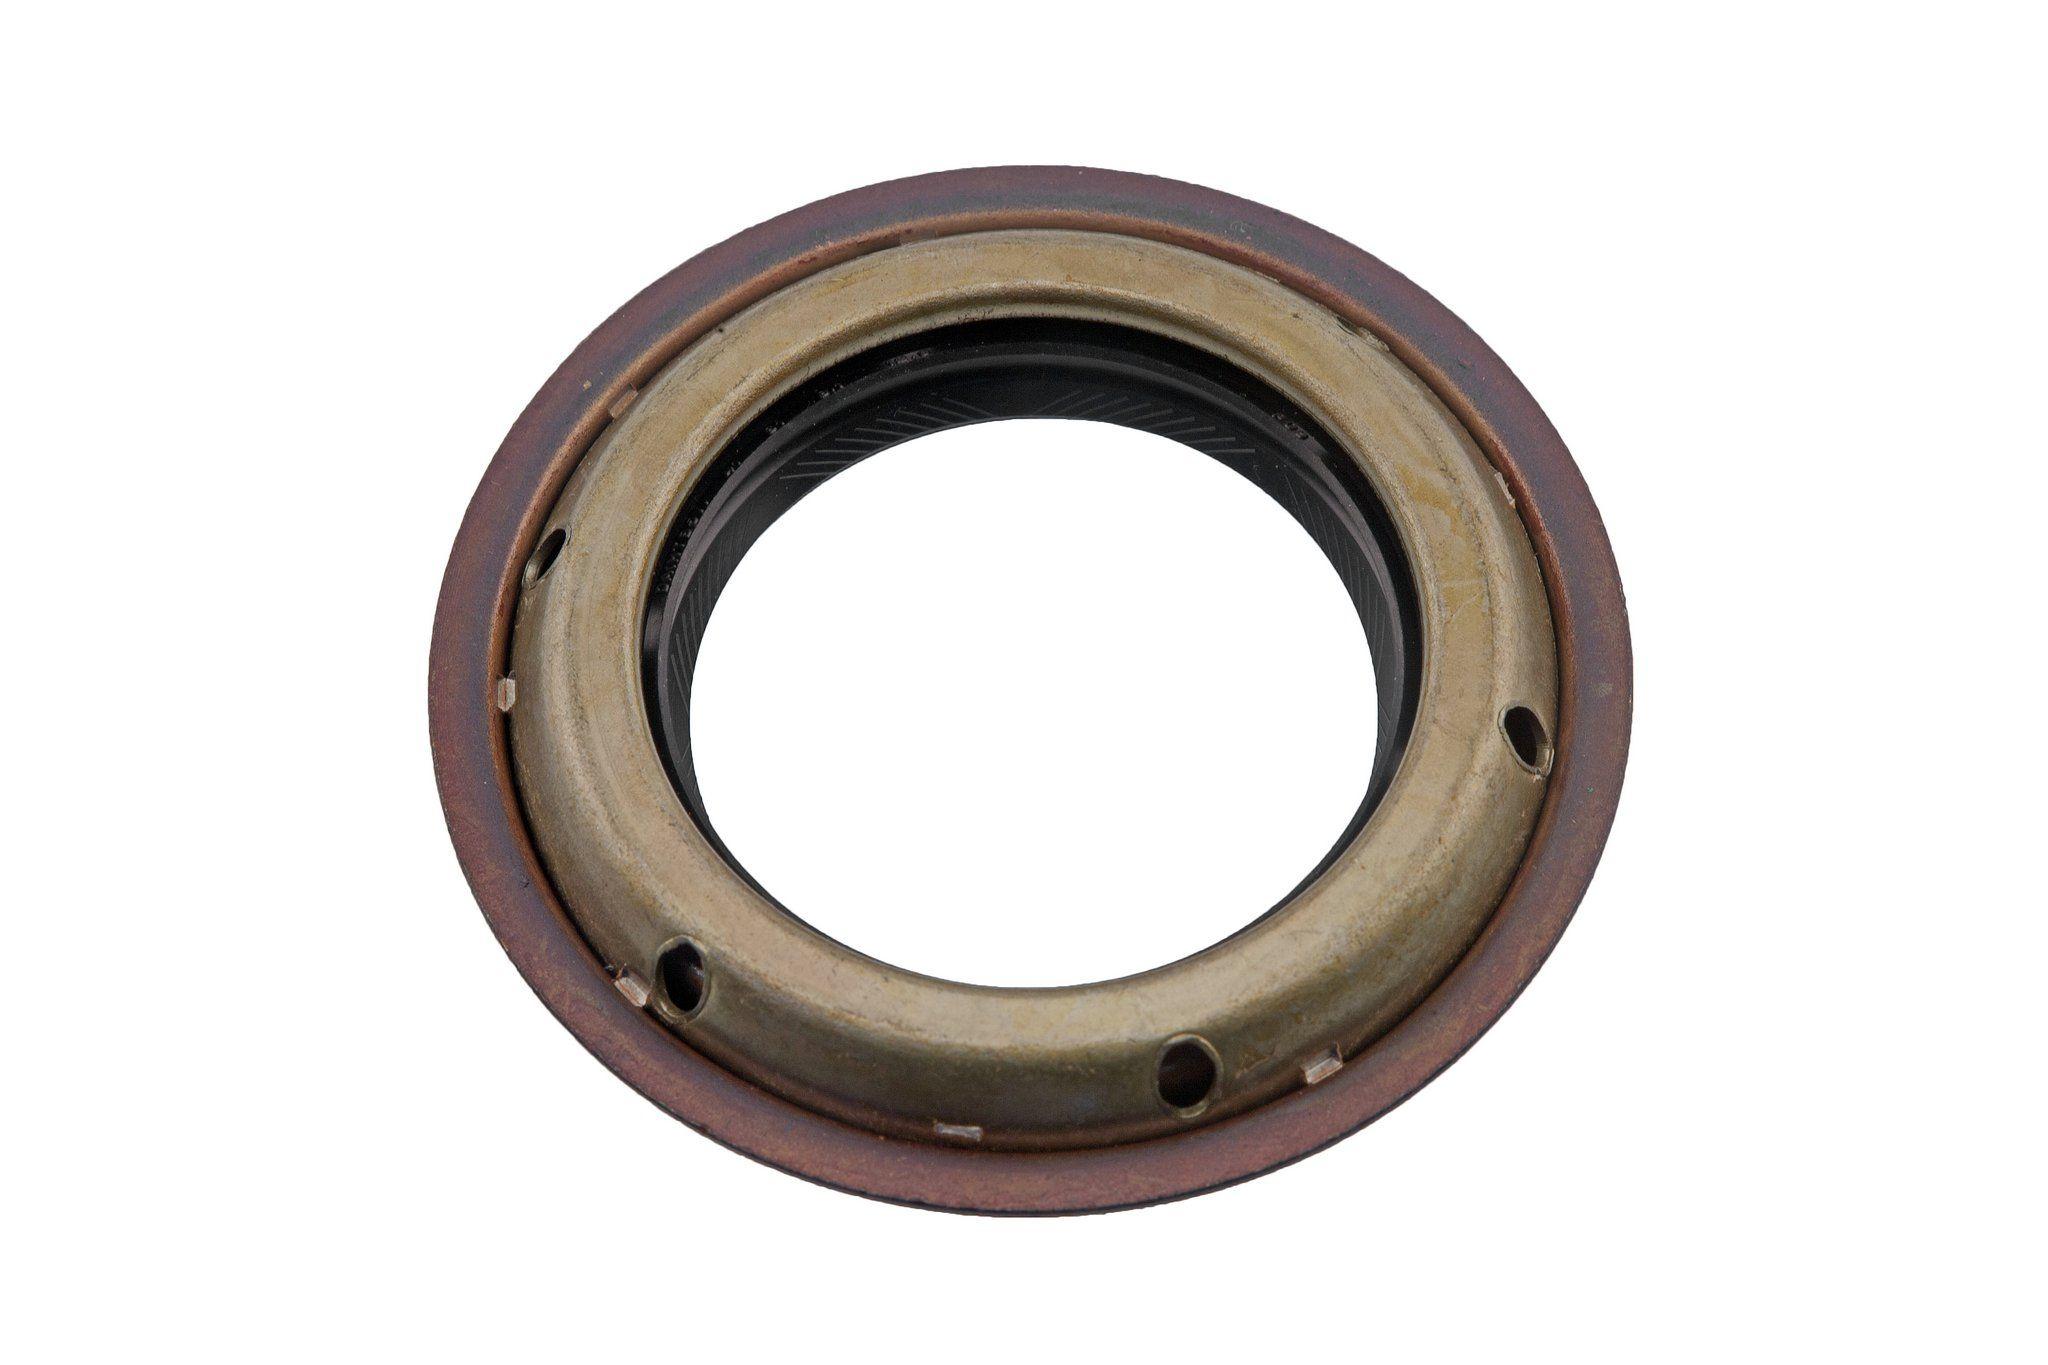 Hyundai Elantra Manual Trans Output Shaft Seal Replacement